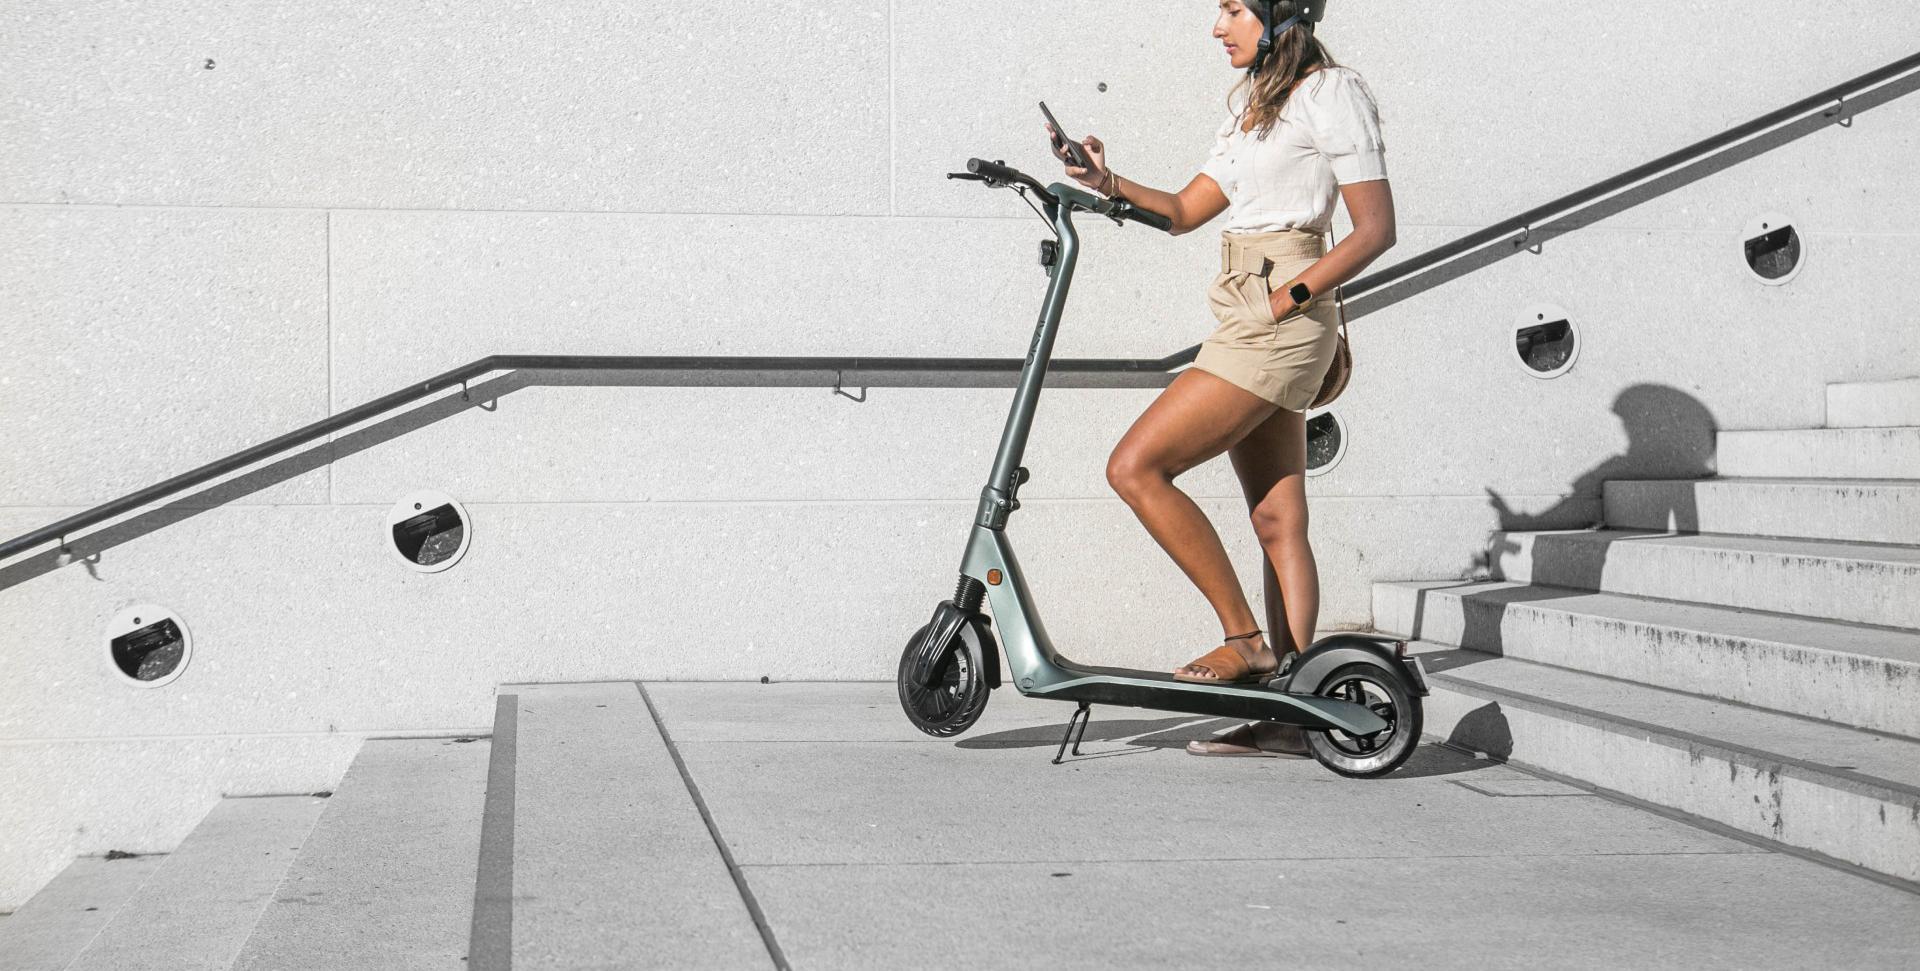 okai-electric-scooter-_-electric-bike-manufacturer-es500-2.jpg